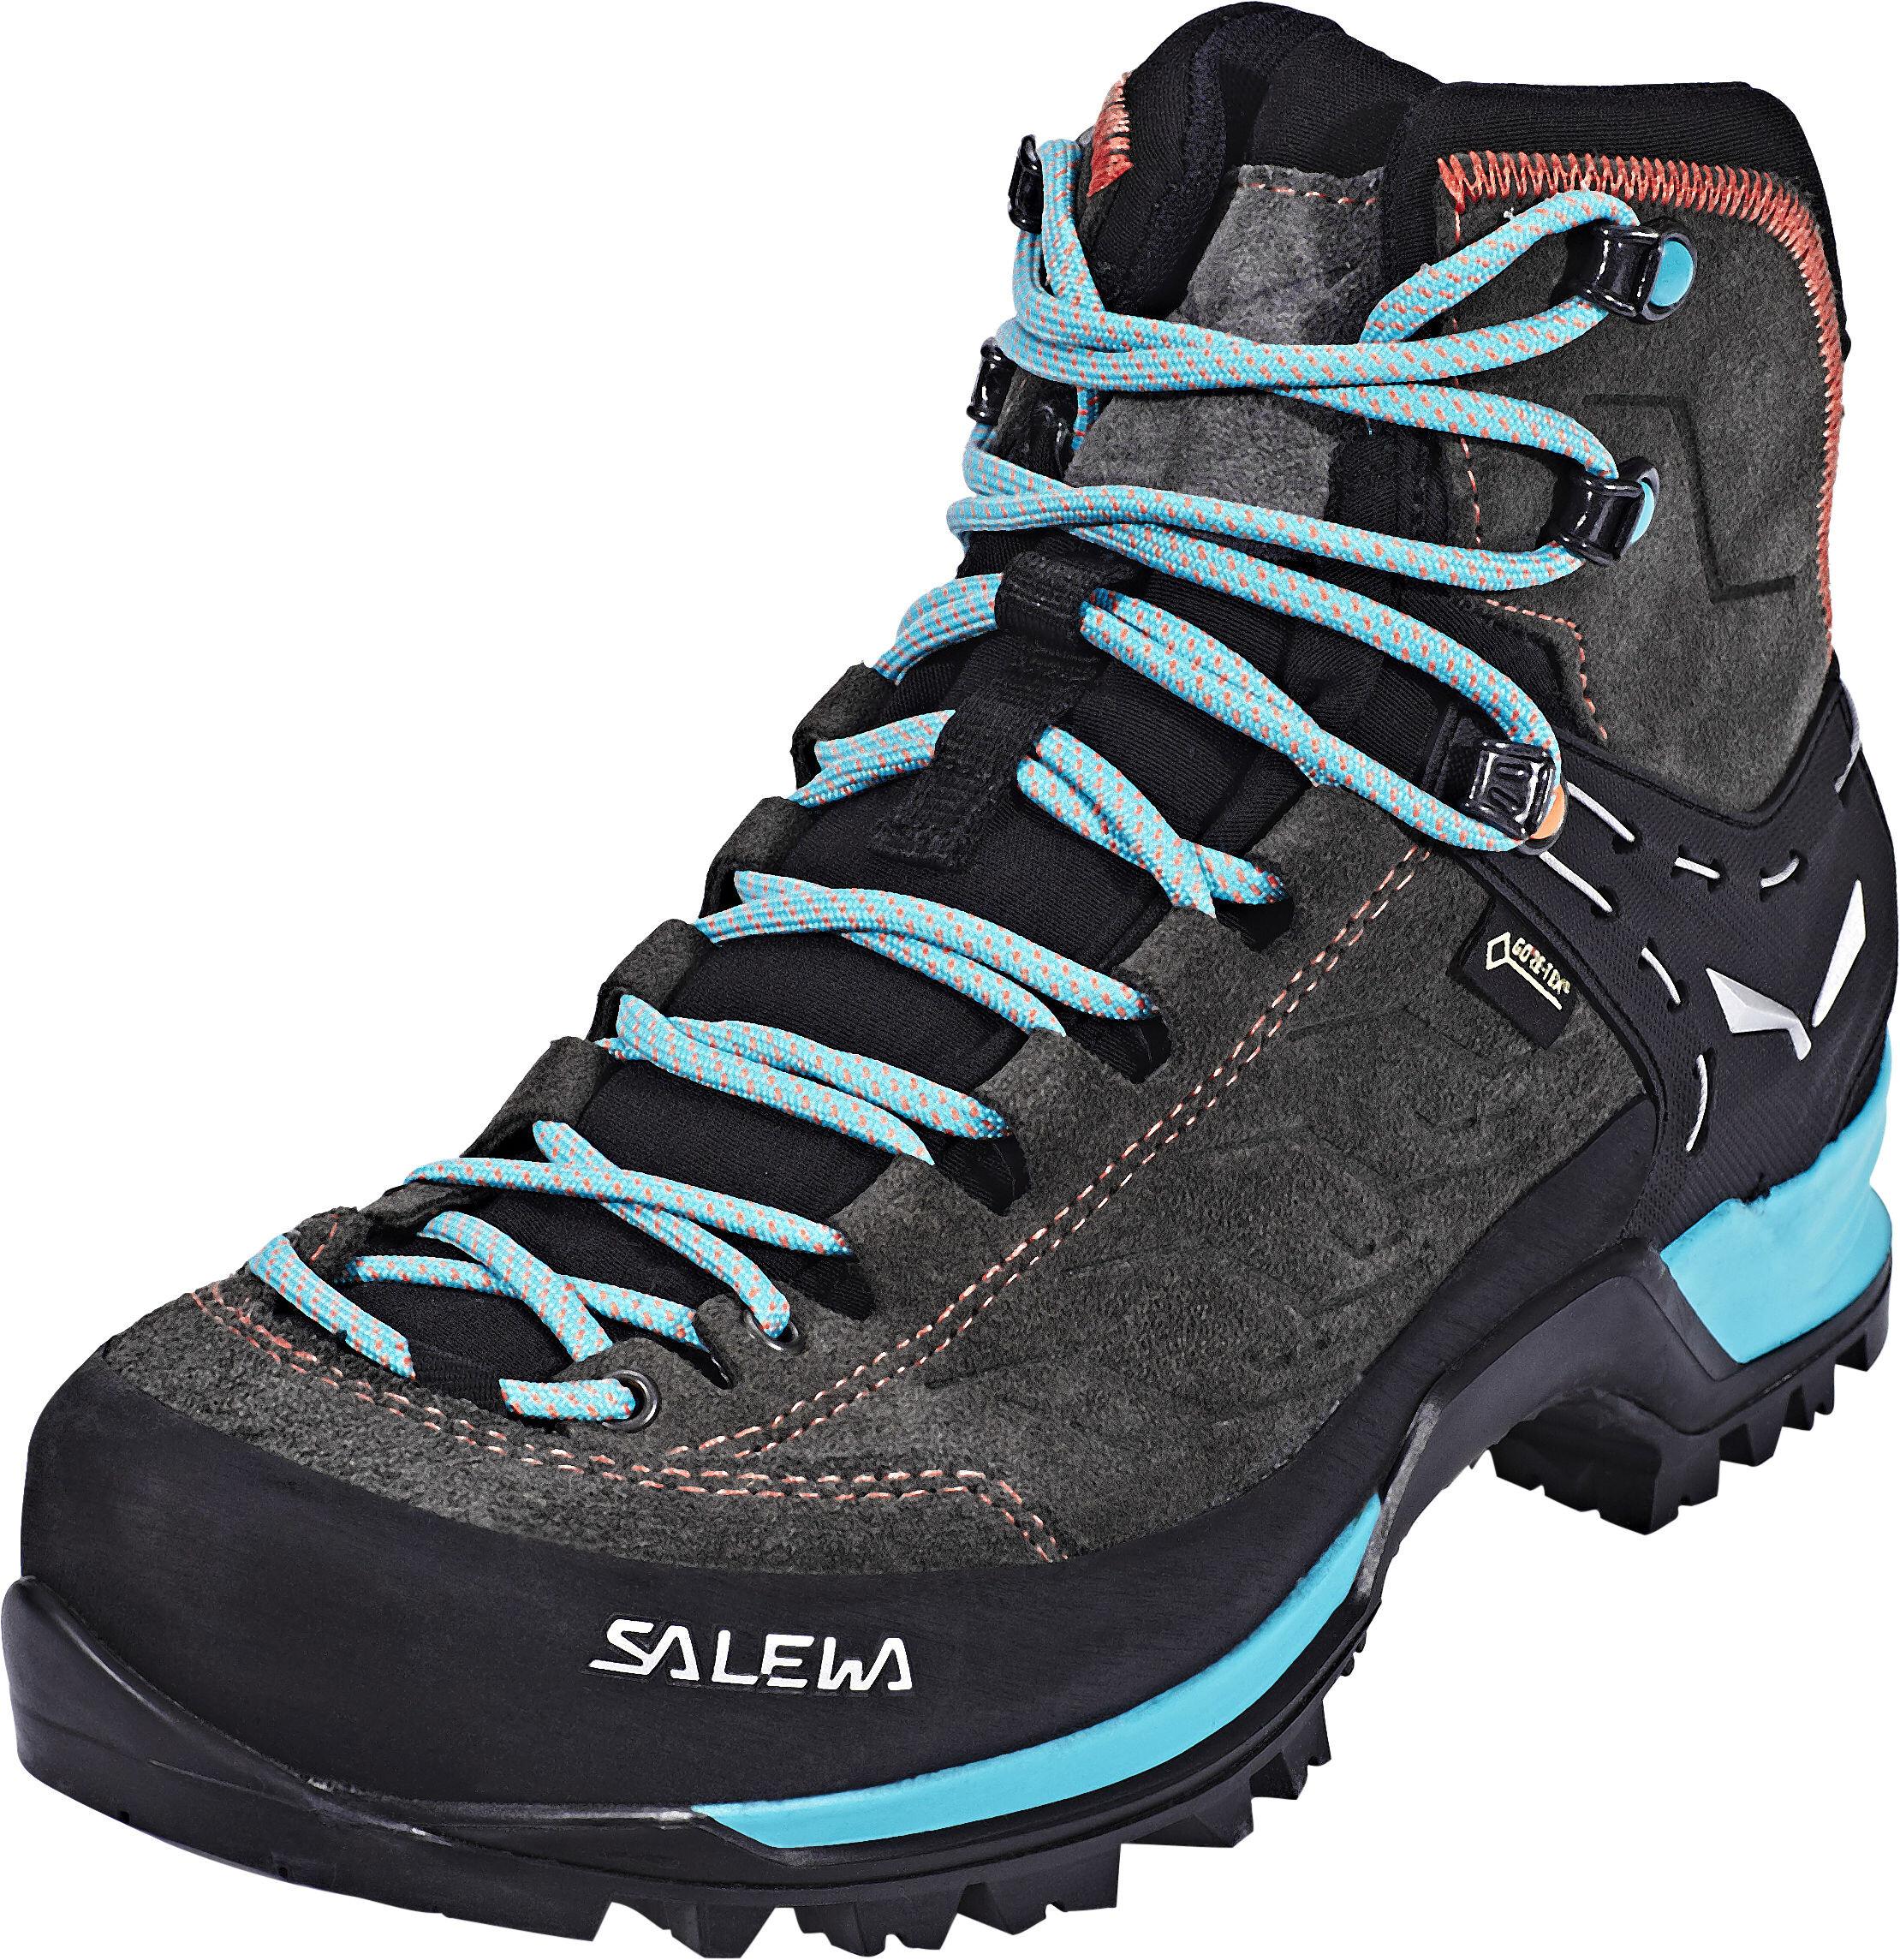 finest selection 60a2a 5419d SALEWA MTN Trainer Mid GTX Shoes Damen magnet/viridian green